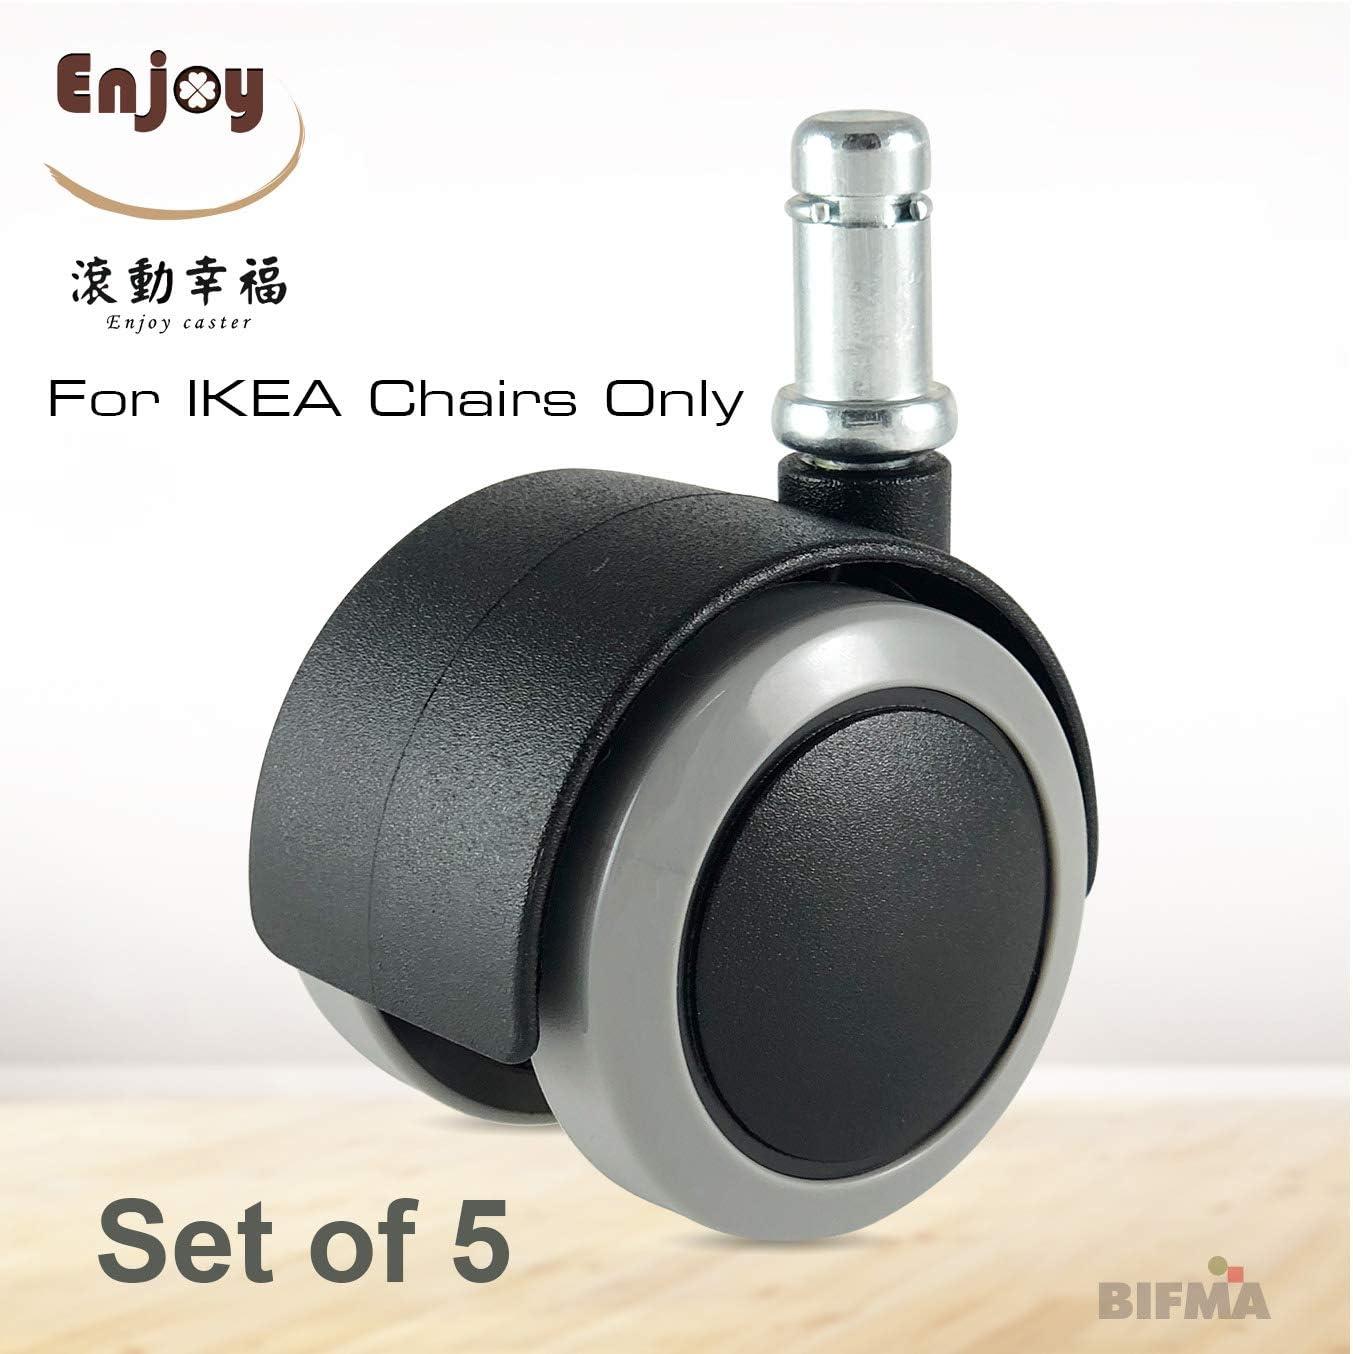 "Set of 5 ENOJOY CASTER Enjoy Office Desk Chair Replacement Soft Polyurethane Wheels Casters with 3//8 /"" stem 10mm Fit IKEA 5007BUG-14-IK Gray//Black"